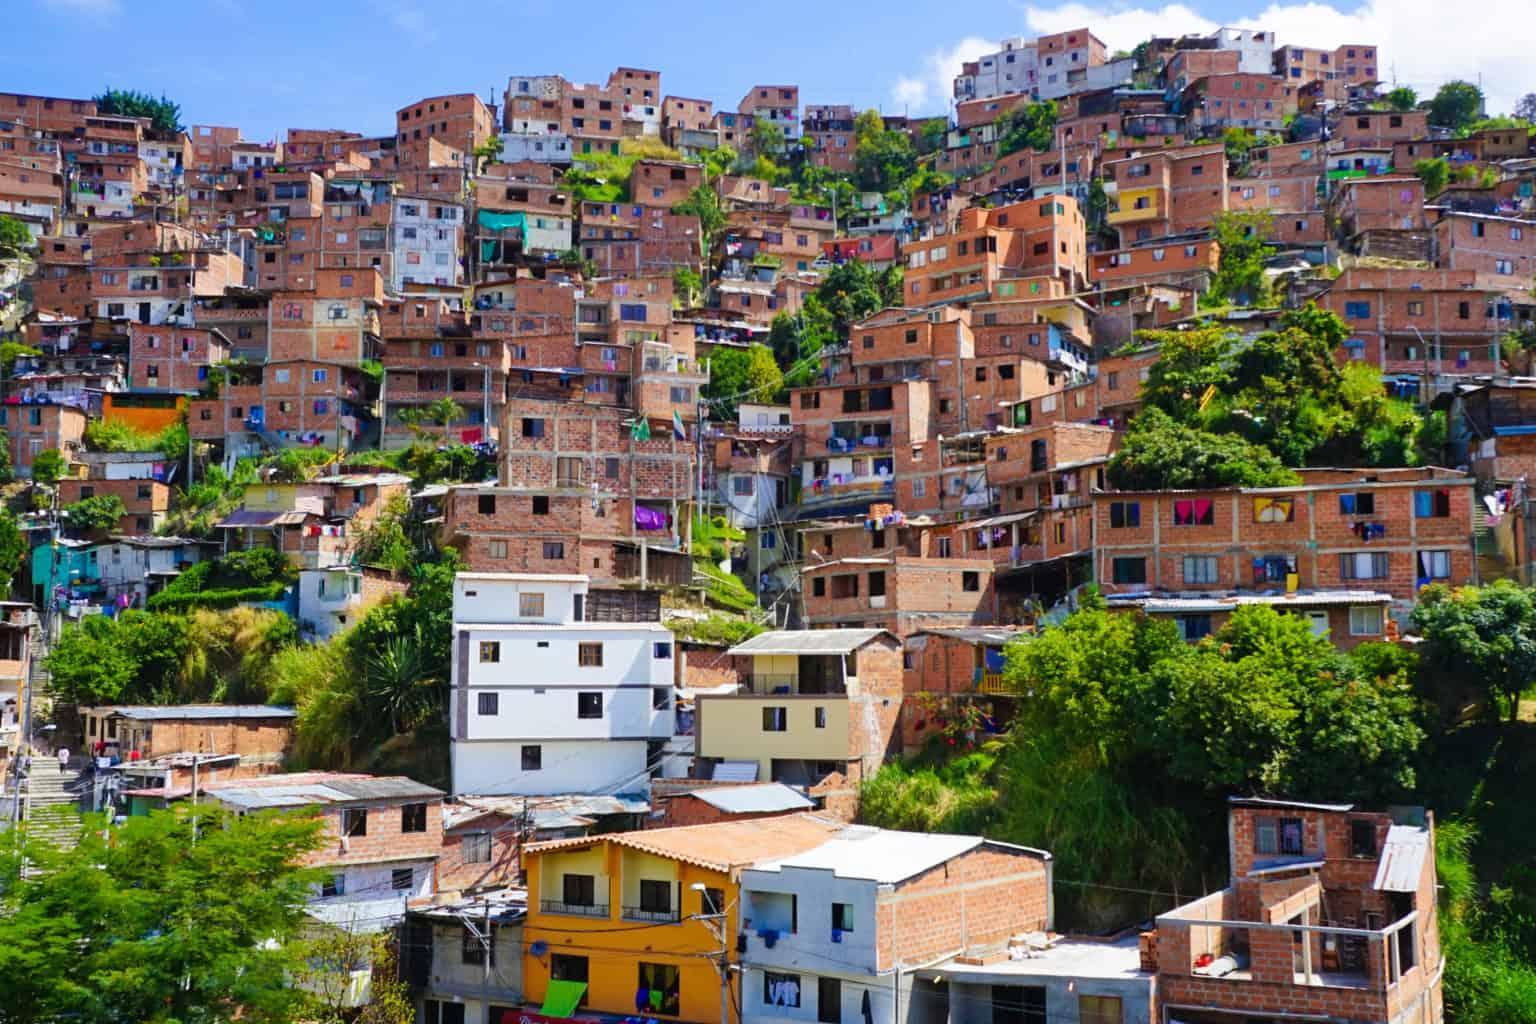 Medellin walking tour